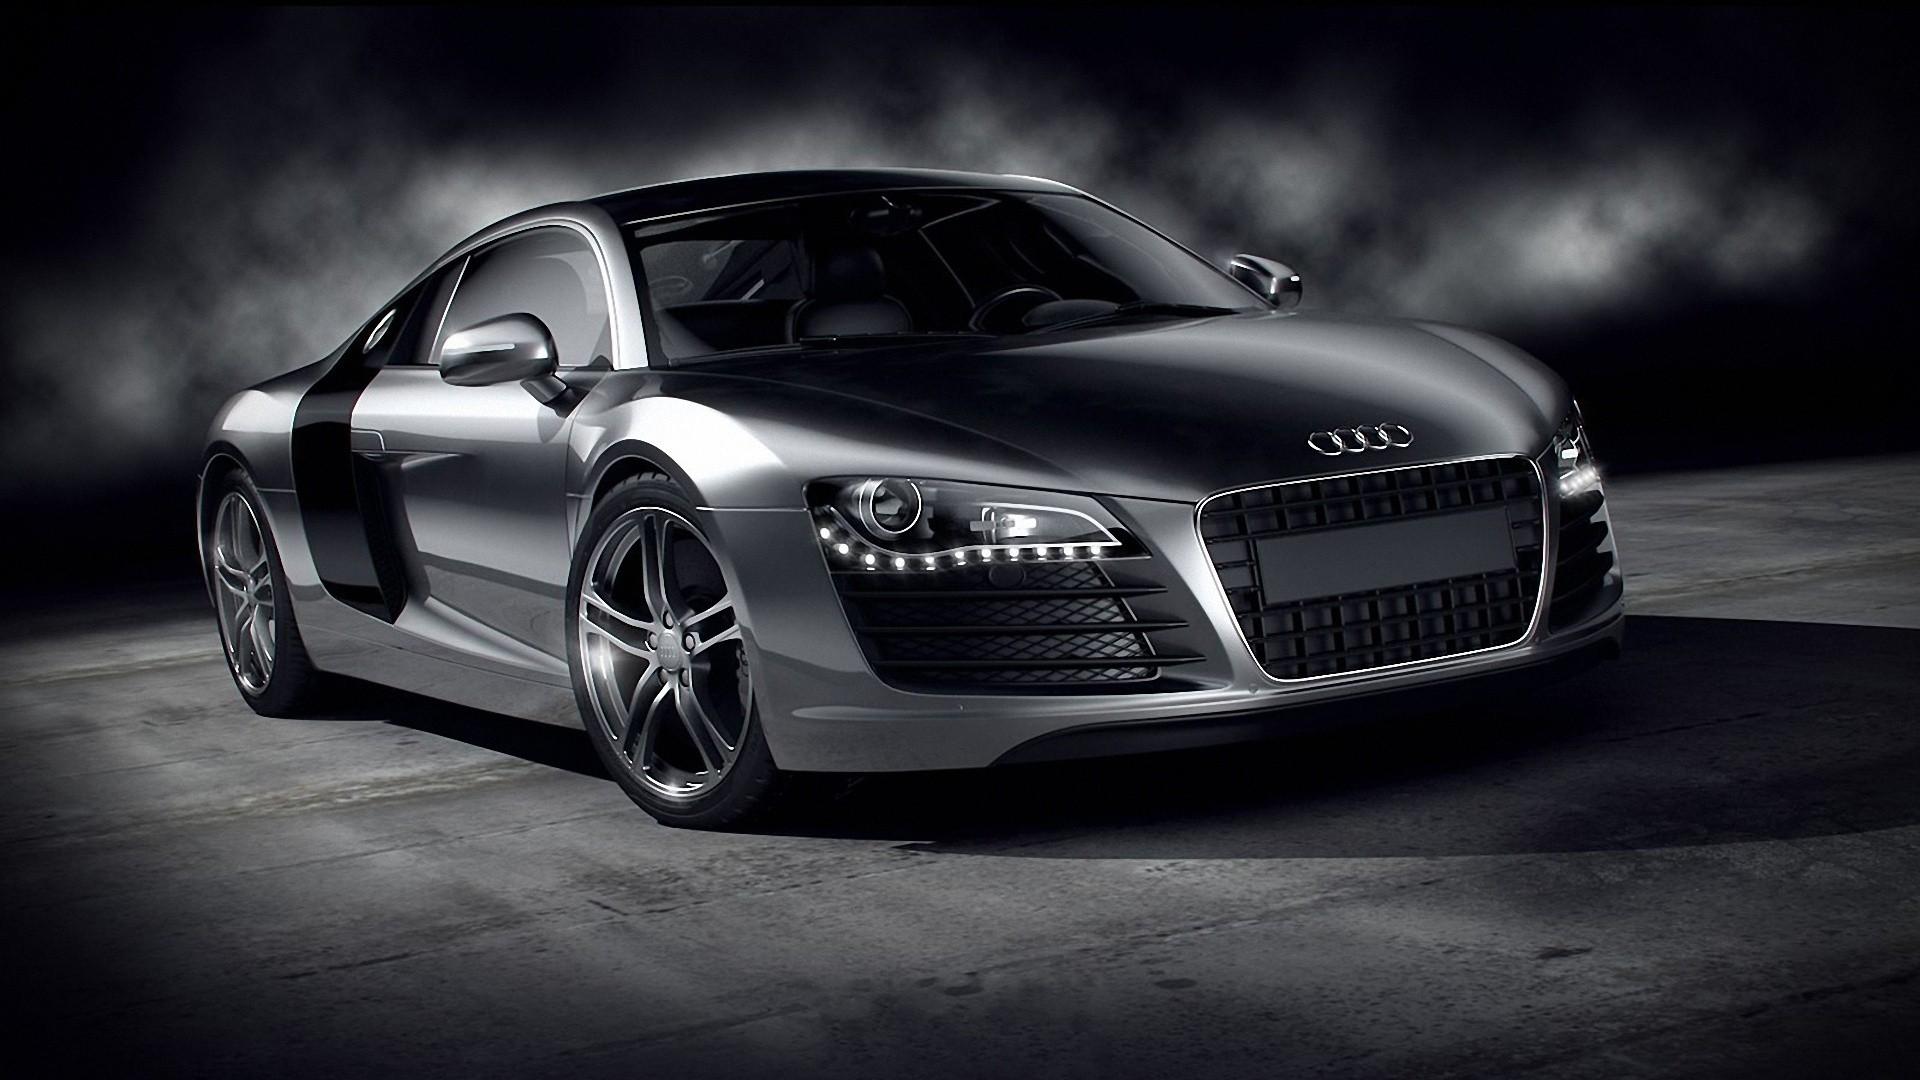 Audi R8 HD Wallpapers Download Desktop Wallpaper Images 1920x1080